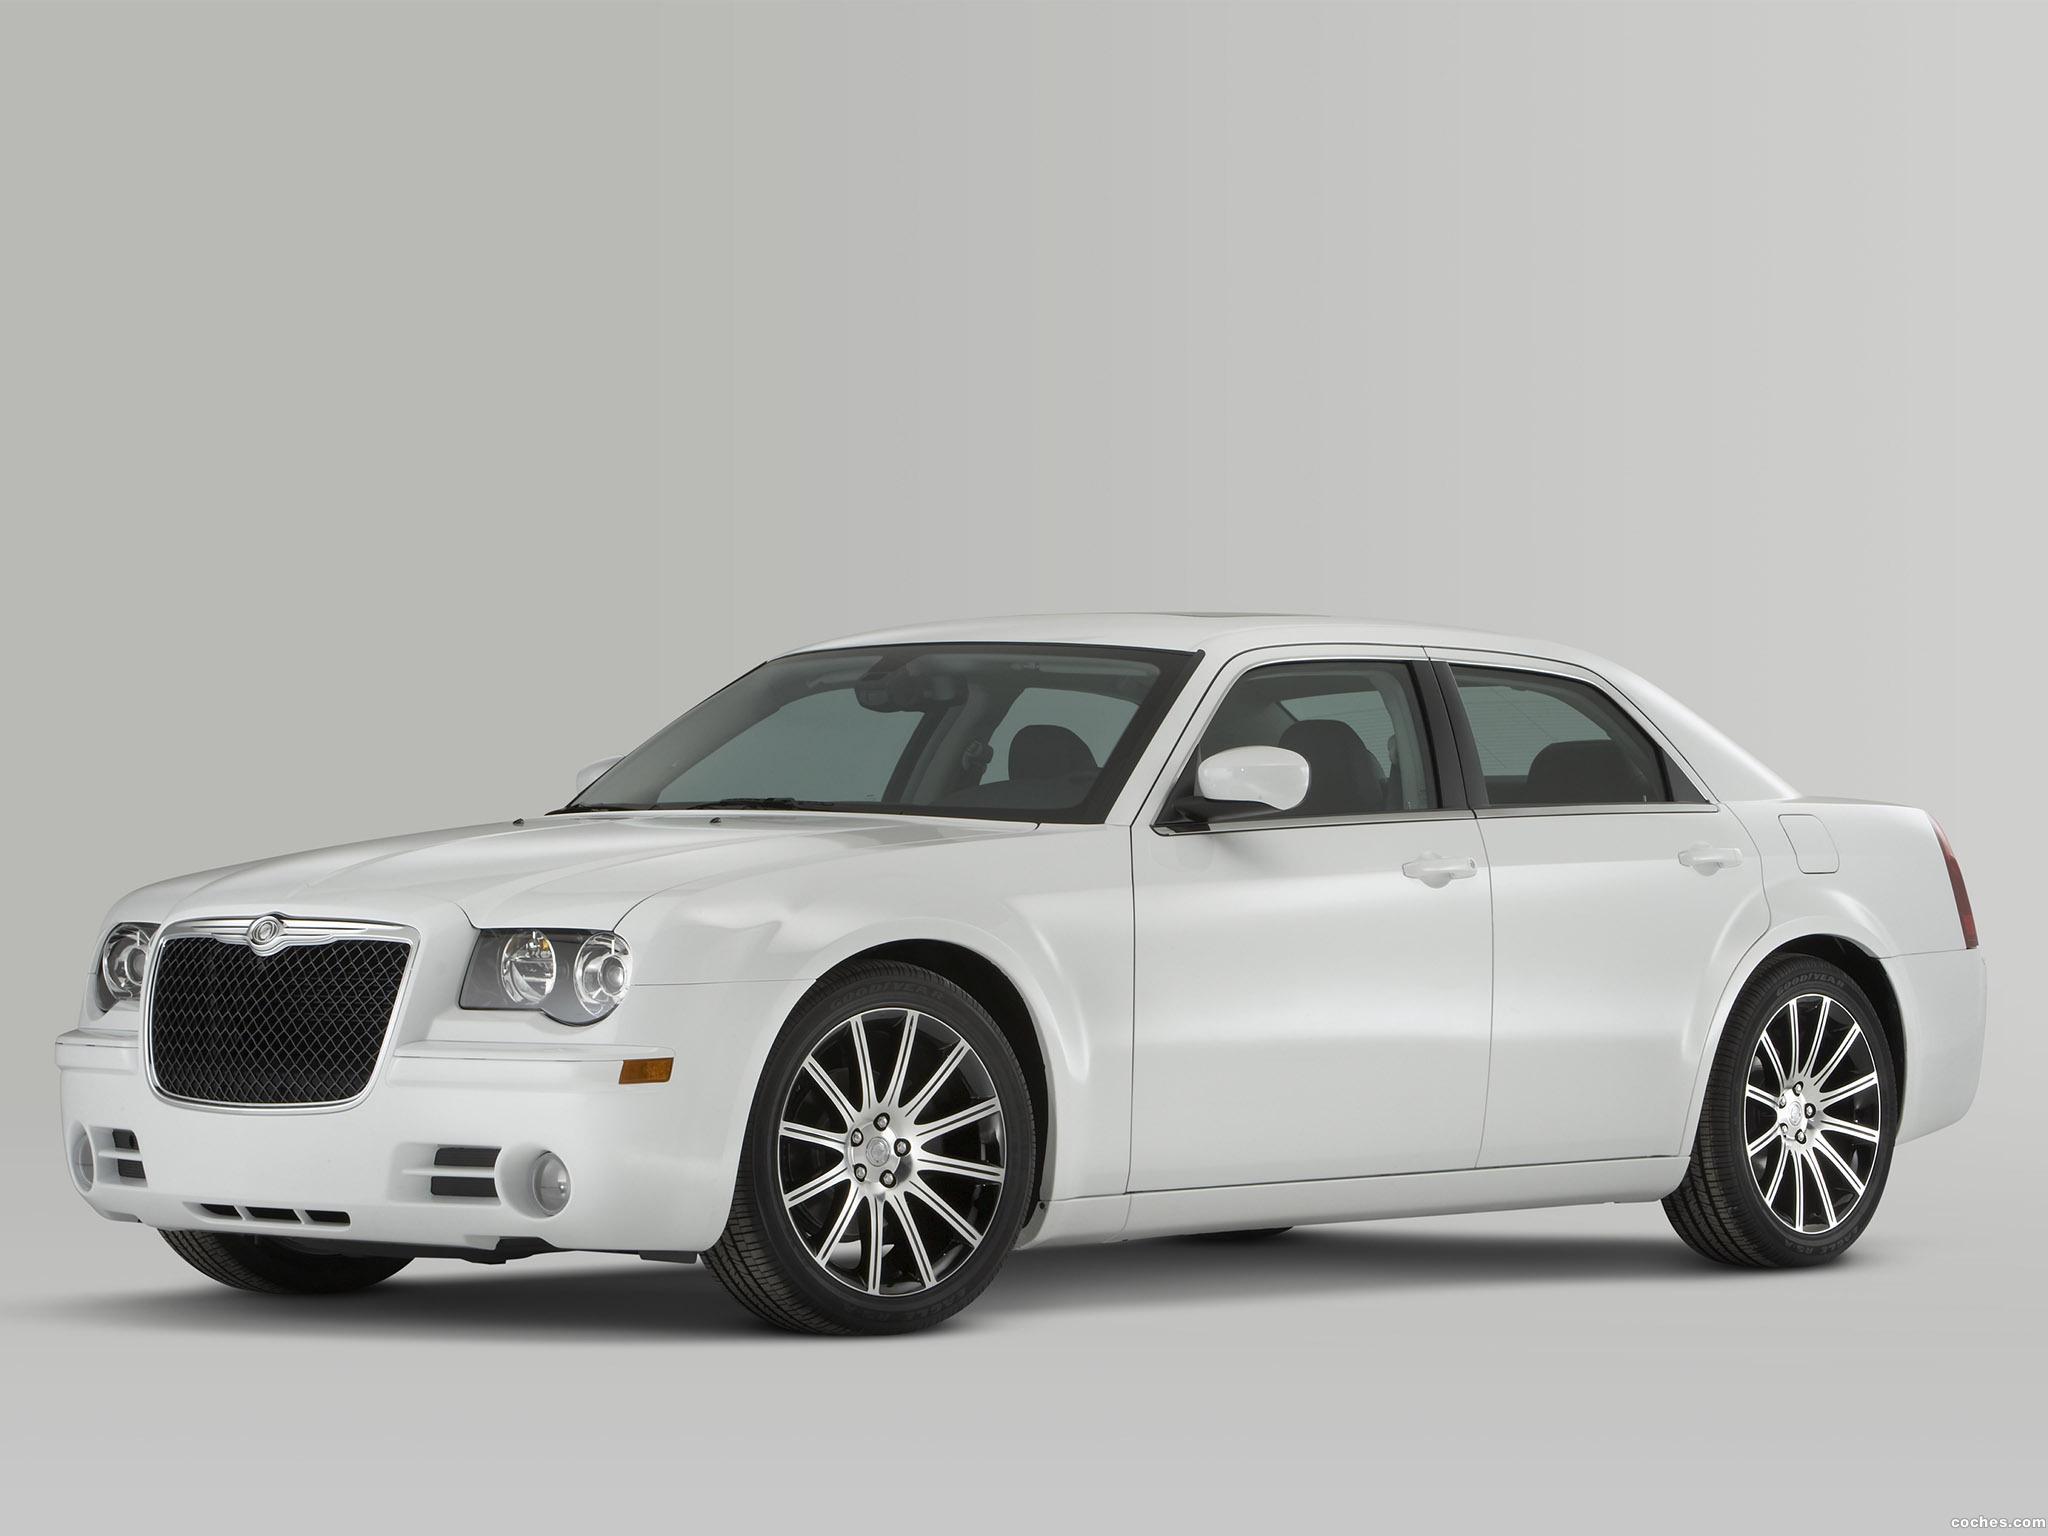 Foto 0 de Chrysler 300C S6 2010